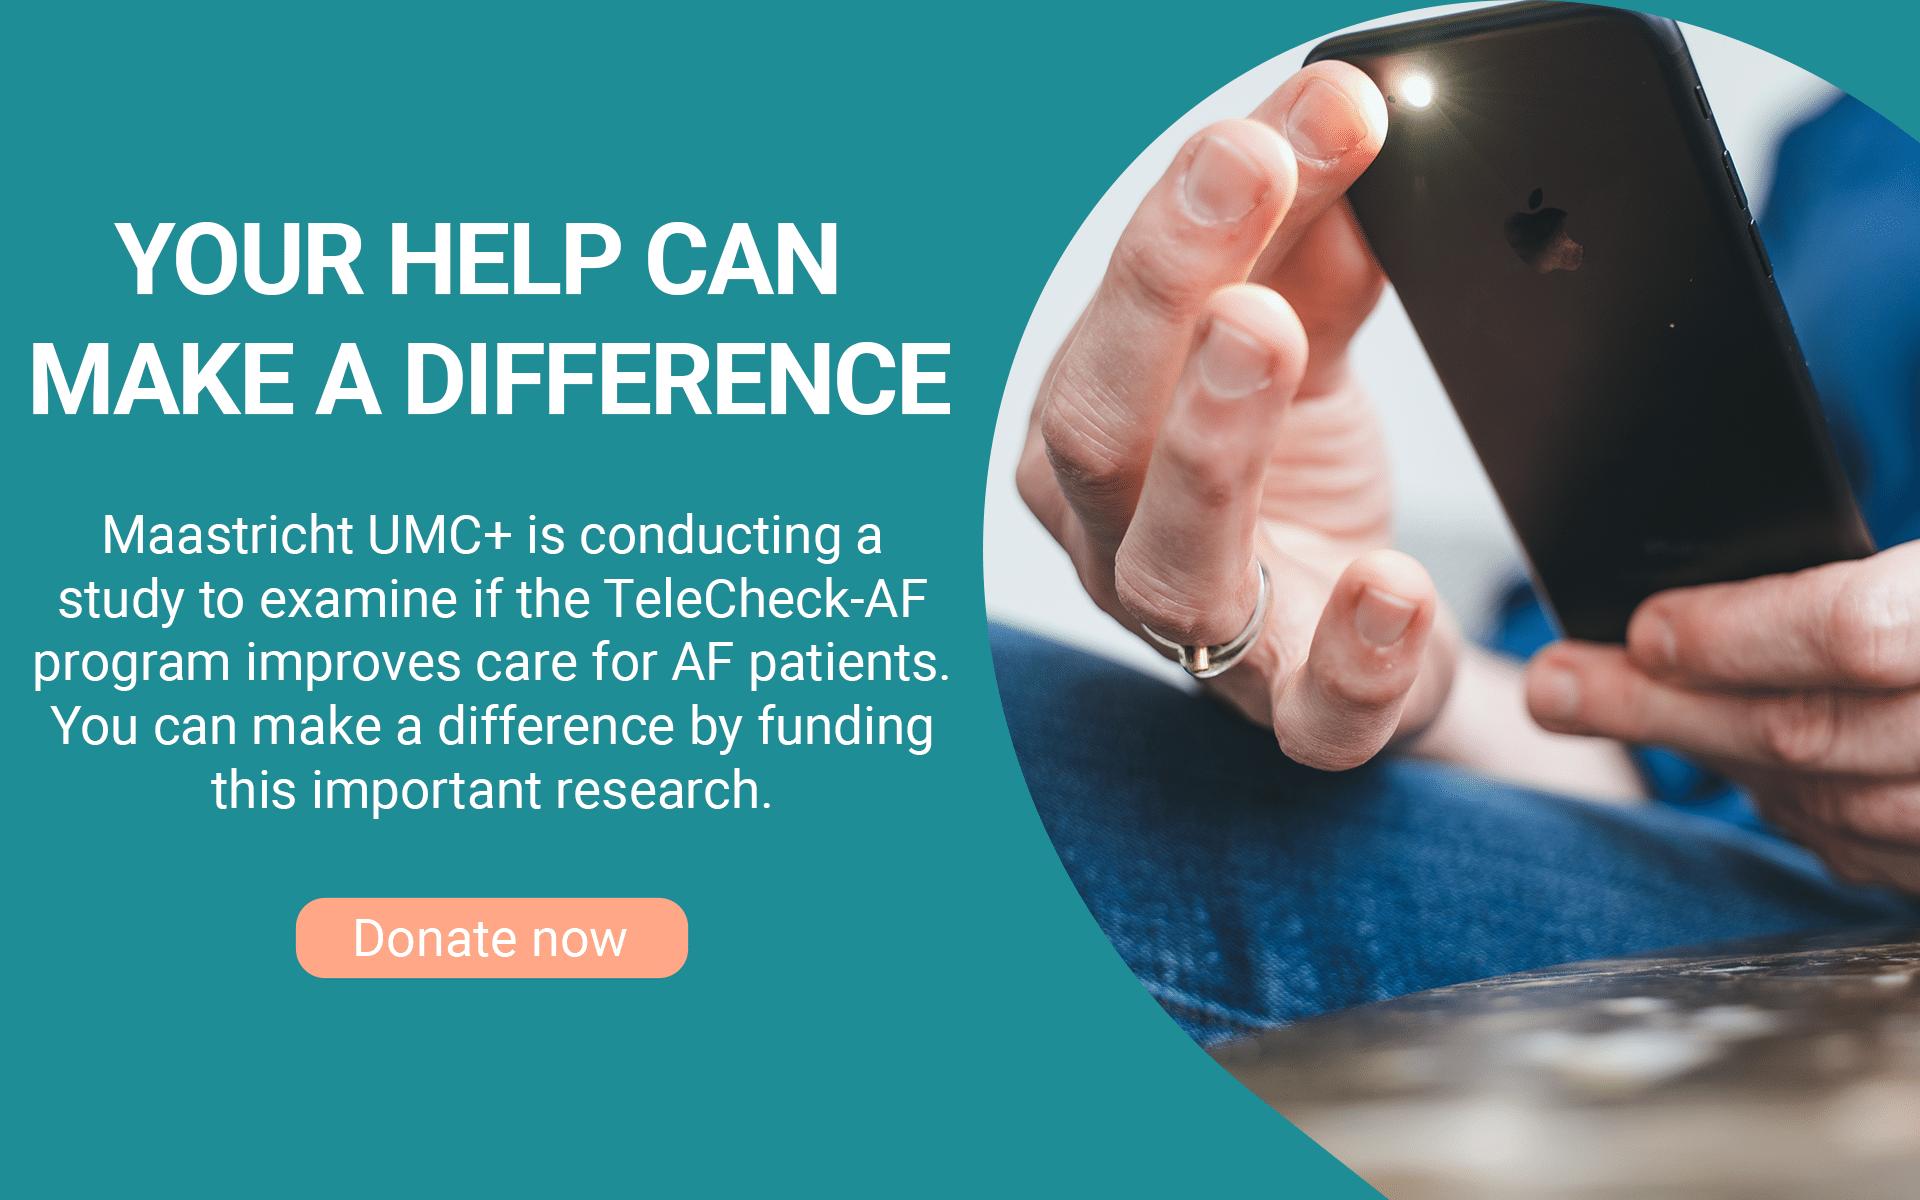 Fund the program